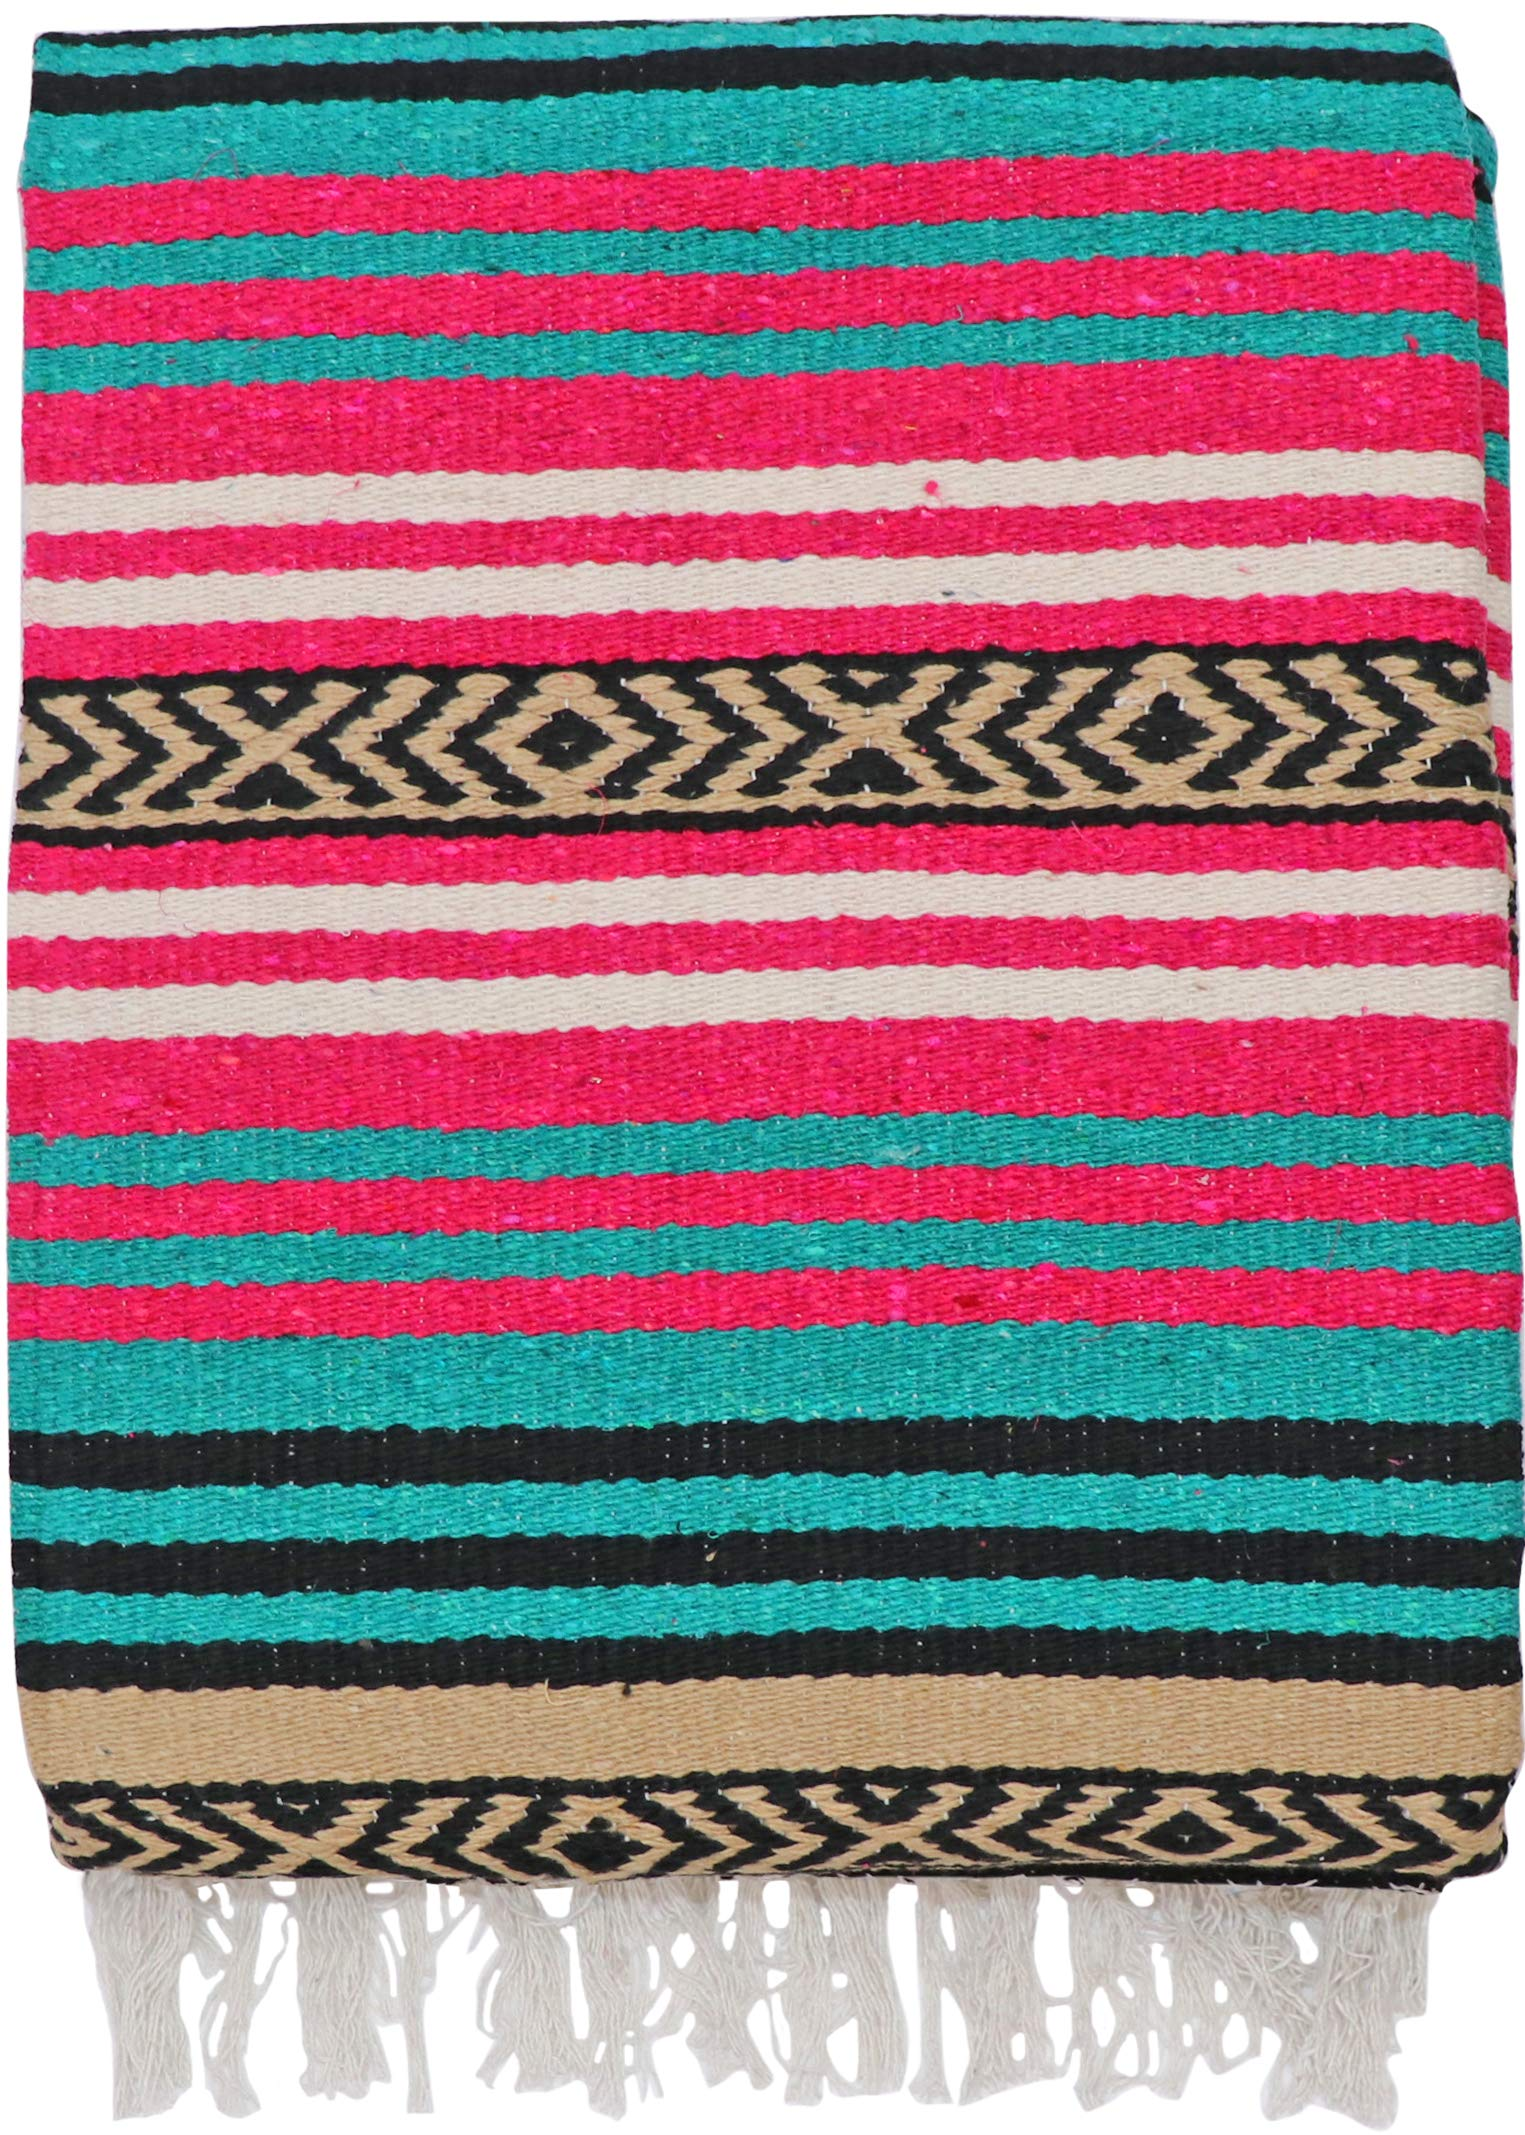 El Paso Designs Peyote Hippie Blanket Classic Mexican Style Falsa Stripe Pattern in Vivid Peyote Colors. Throw, Bed, Tapestry, or Yoga Blanket. Hand Woven Acrylic, 57'' x 74'' (Peyote 3)